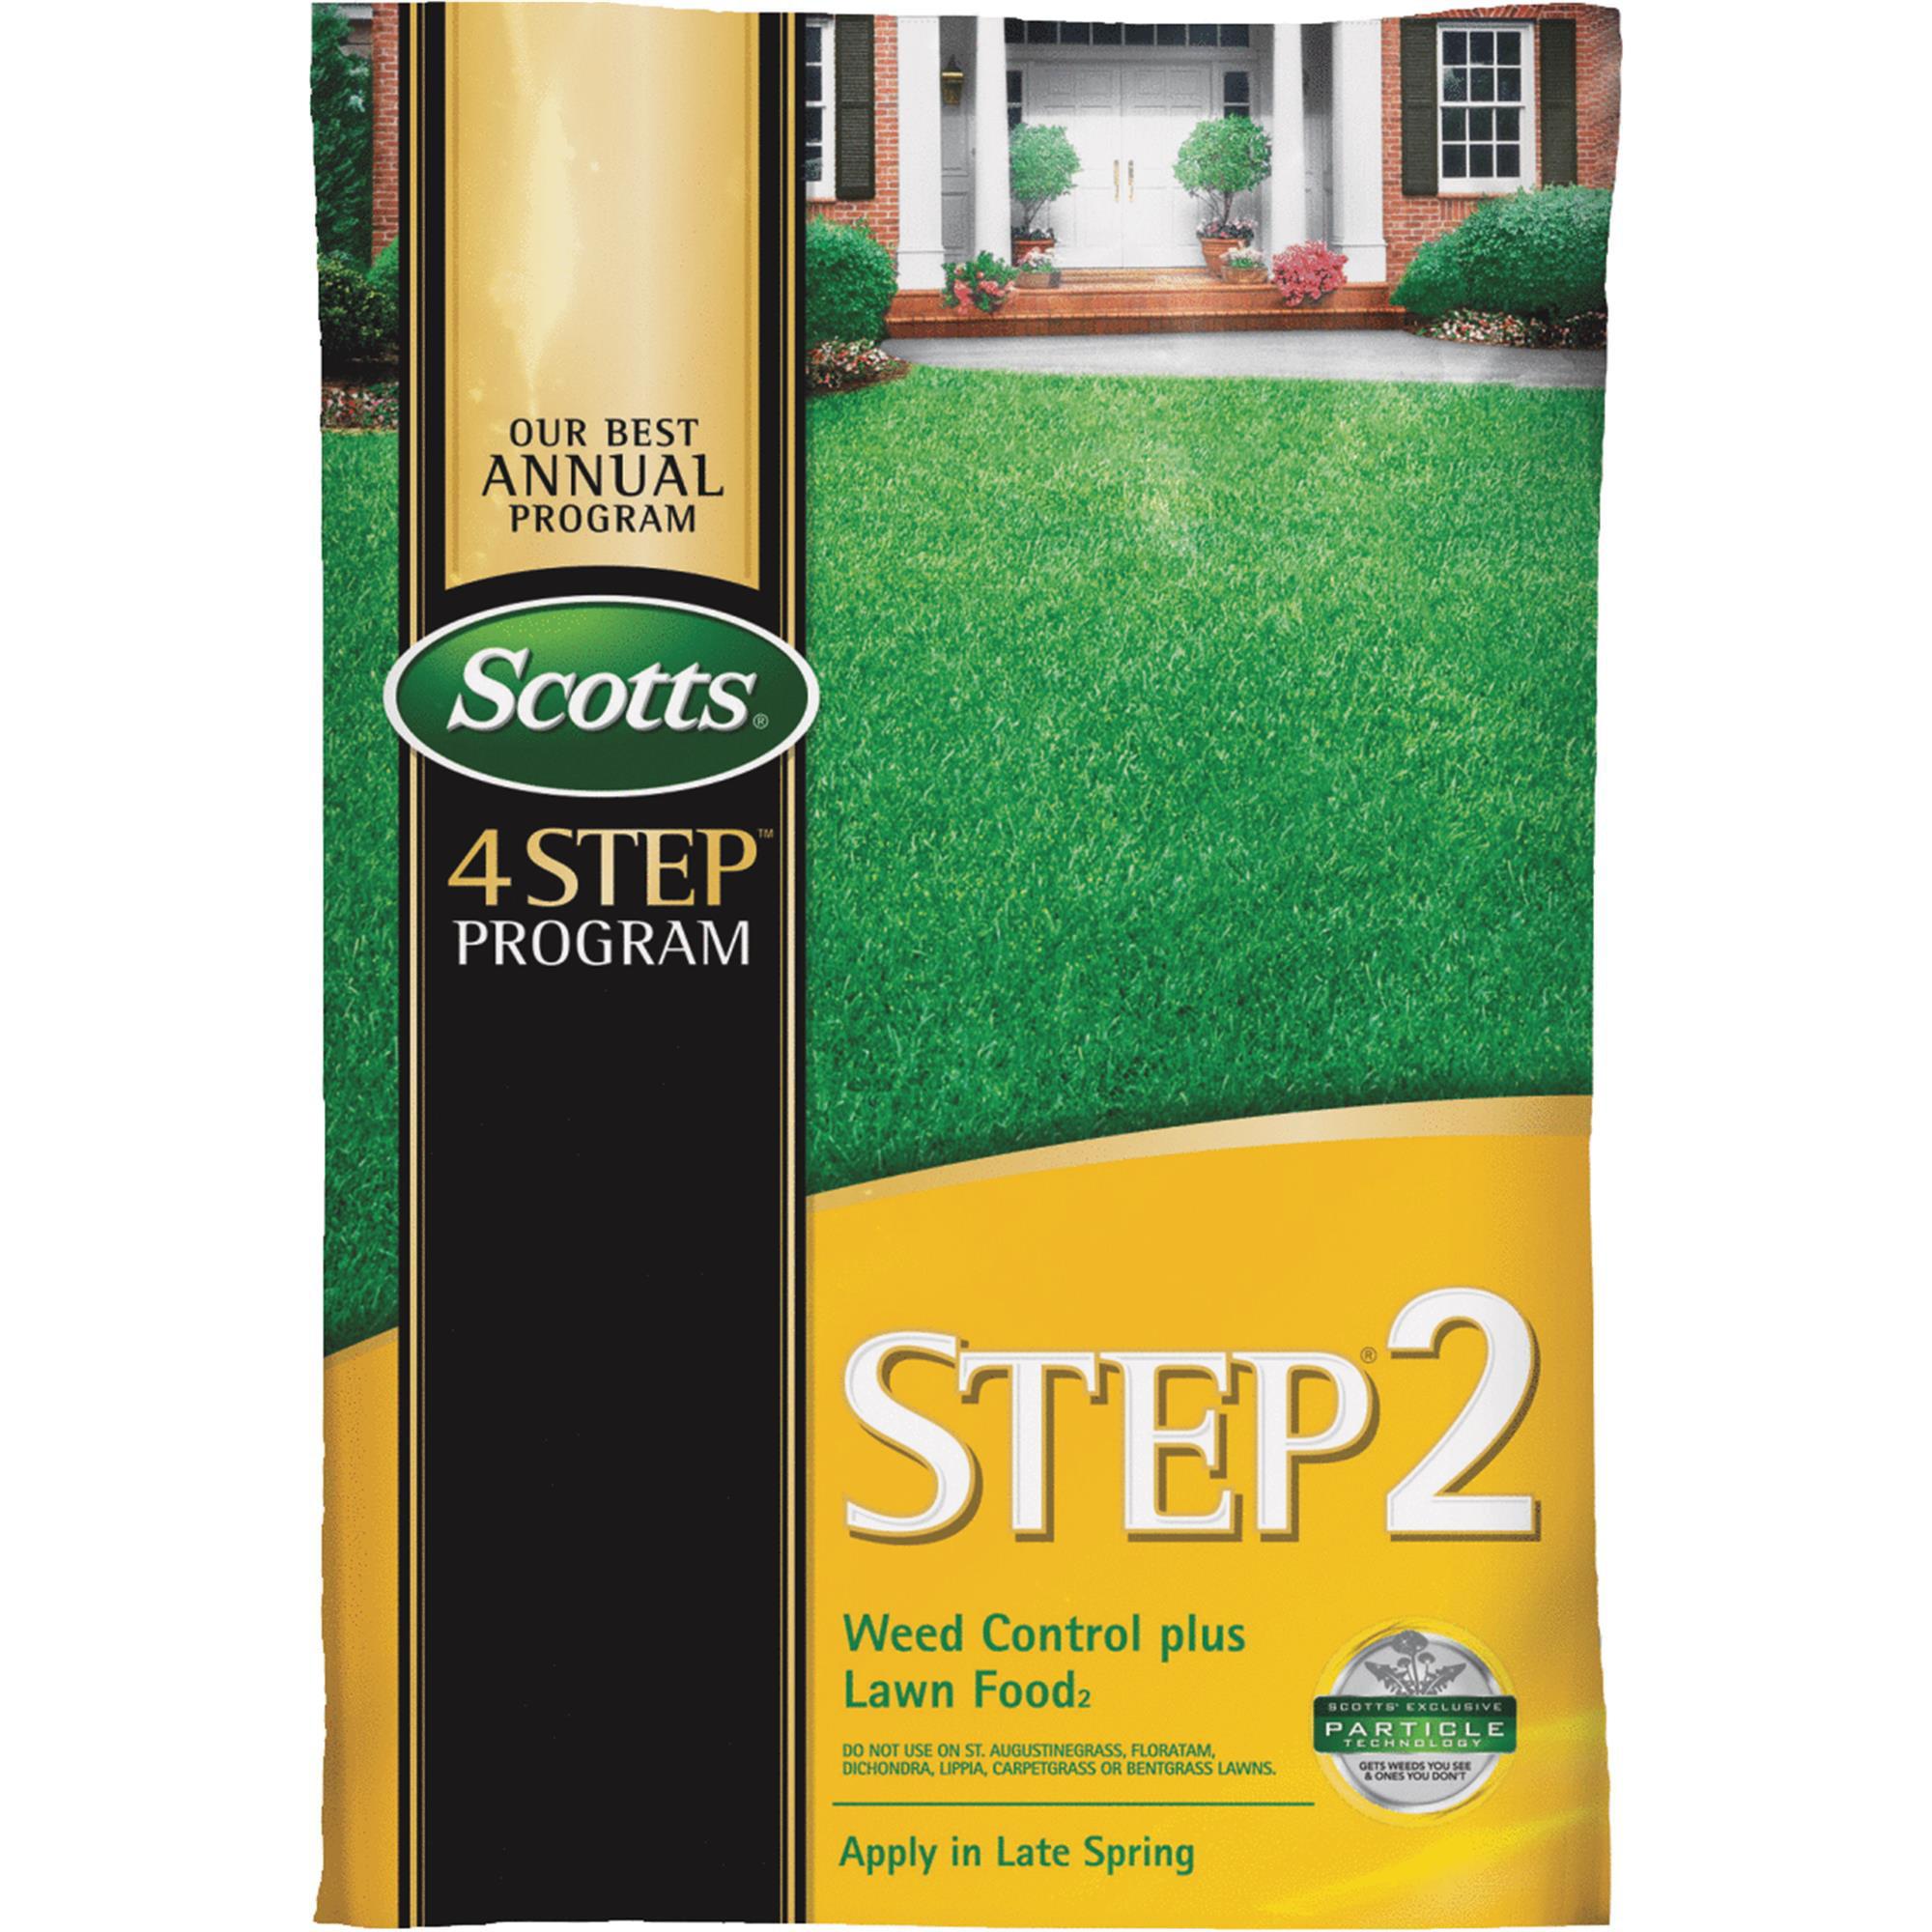 scotts 4-step program step 2 lawn fertilizer with weed killer